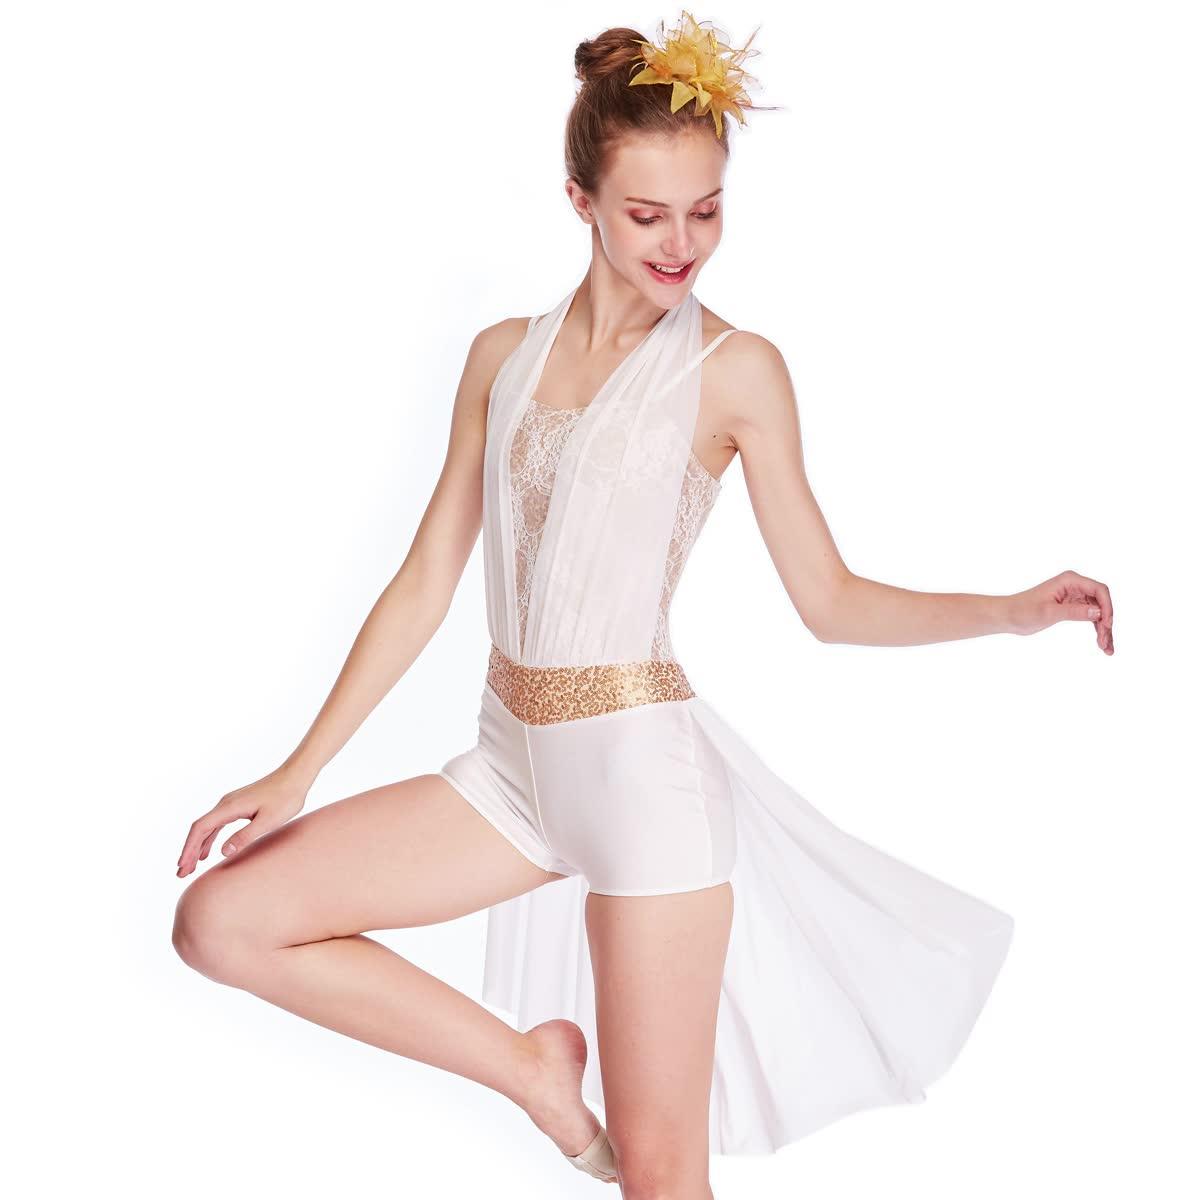 MiDee ハーフスカートホルターネック叙情的なダンスドレス衣装ジャズラテンアイススケートバレエダンス衣装